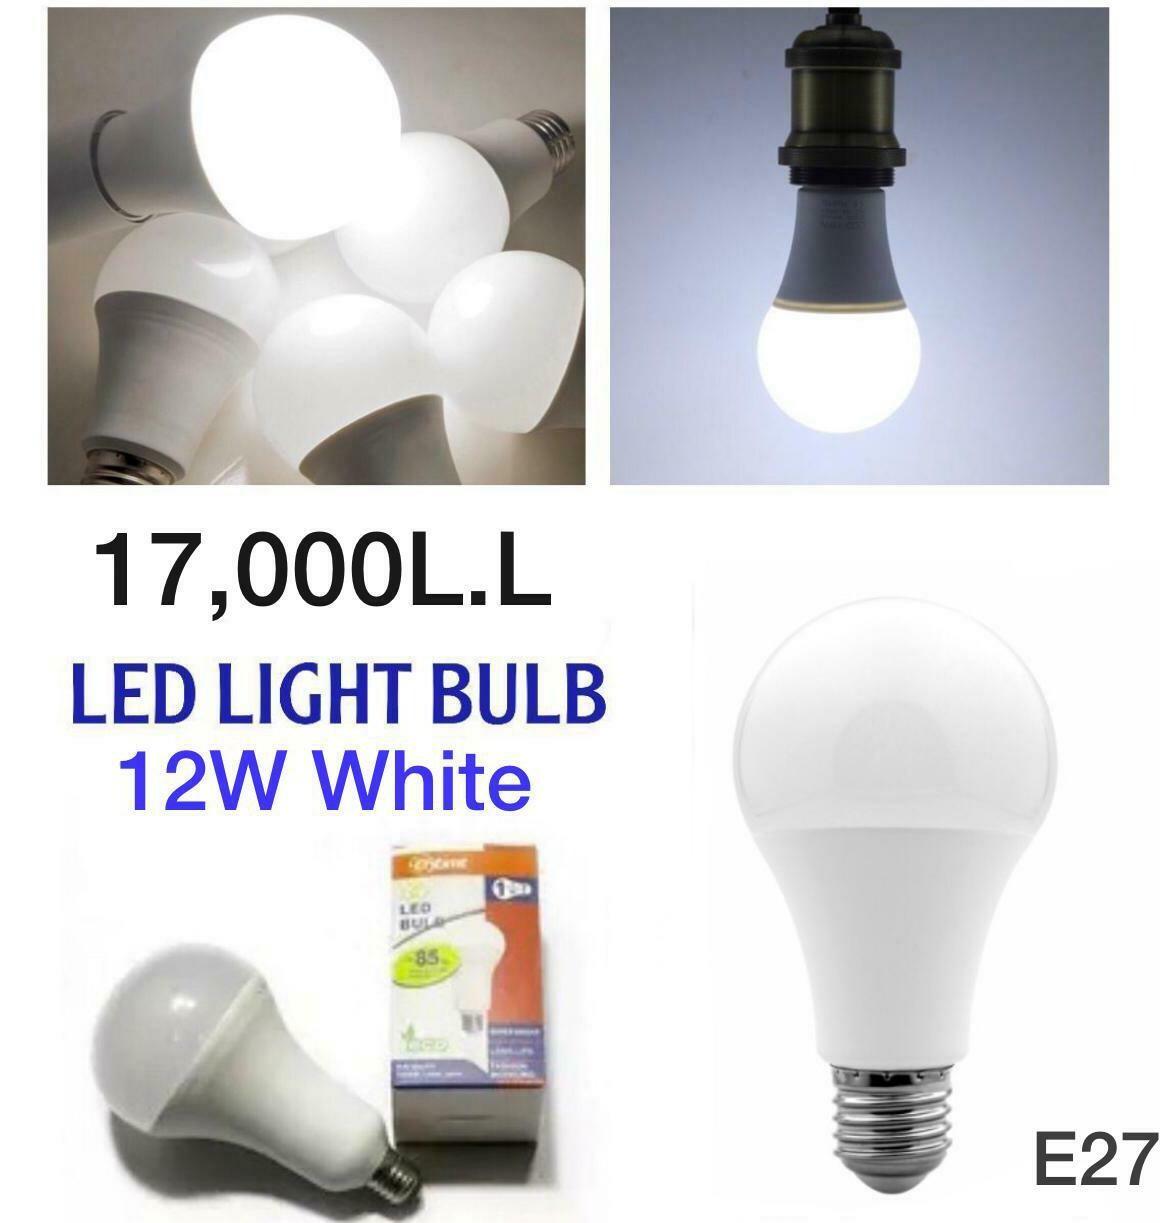 LED Bulb (white 12W)